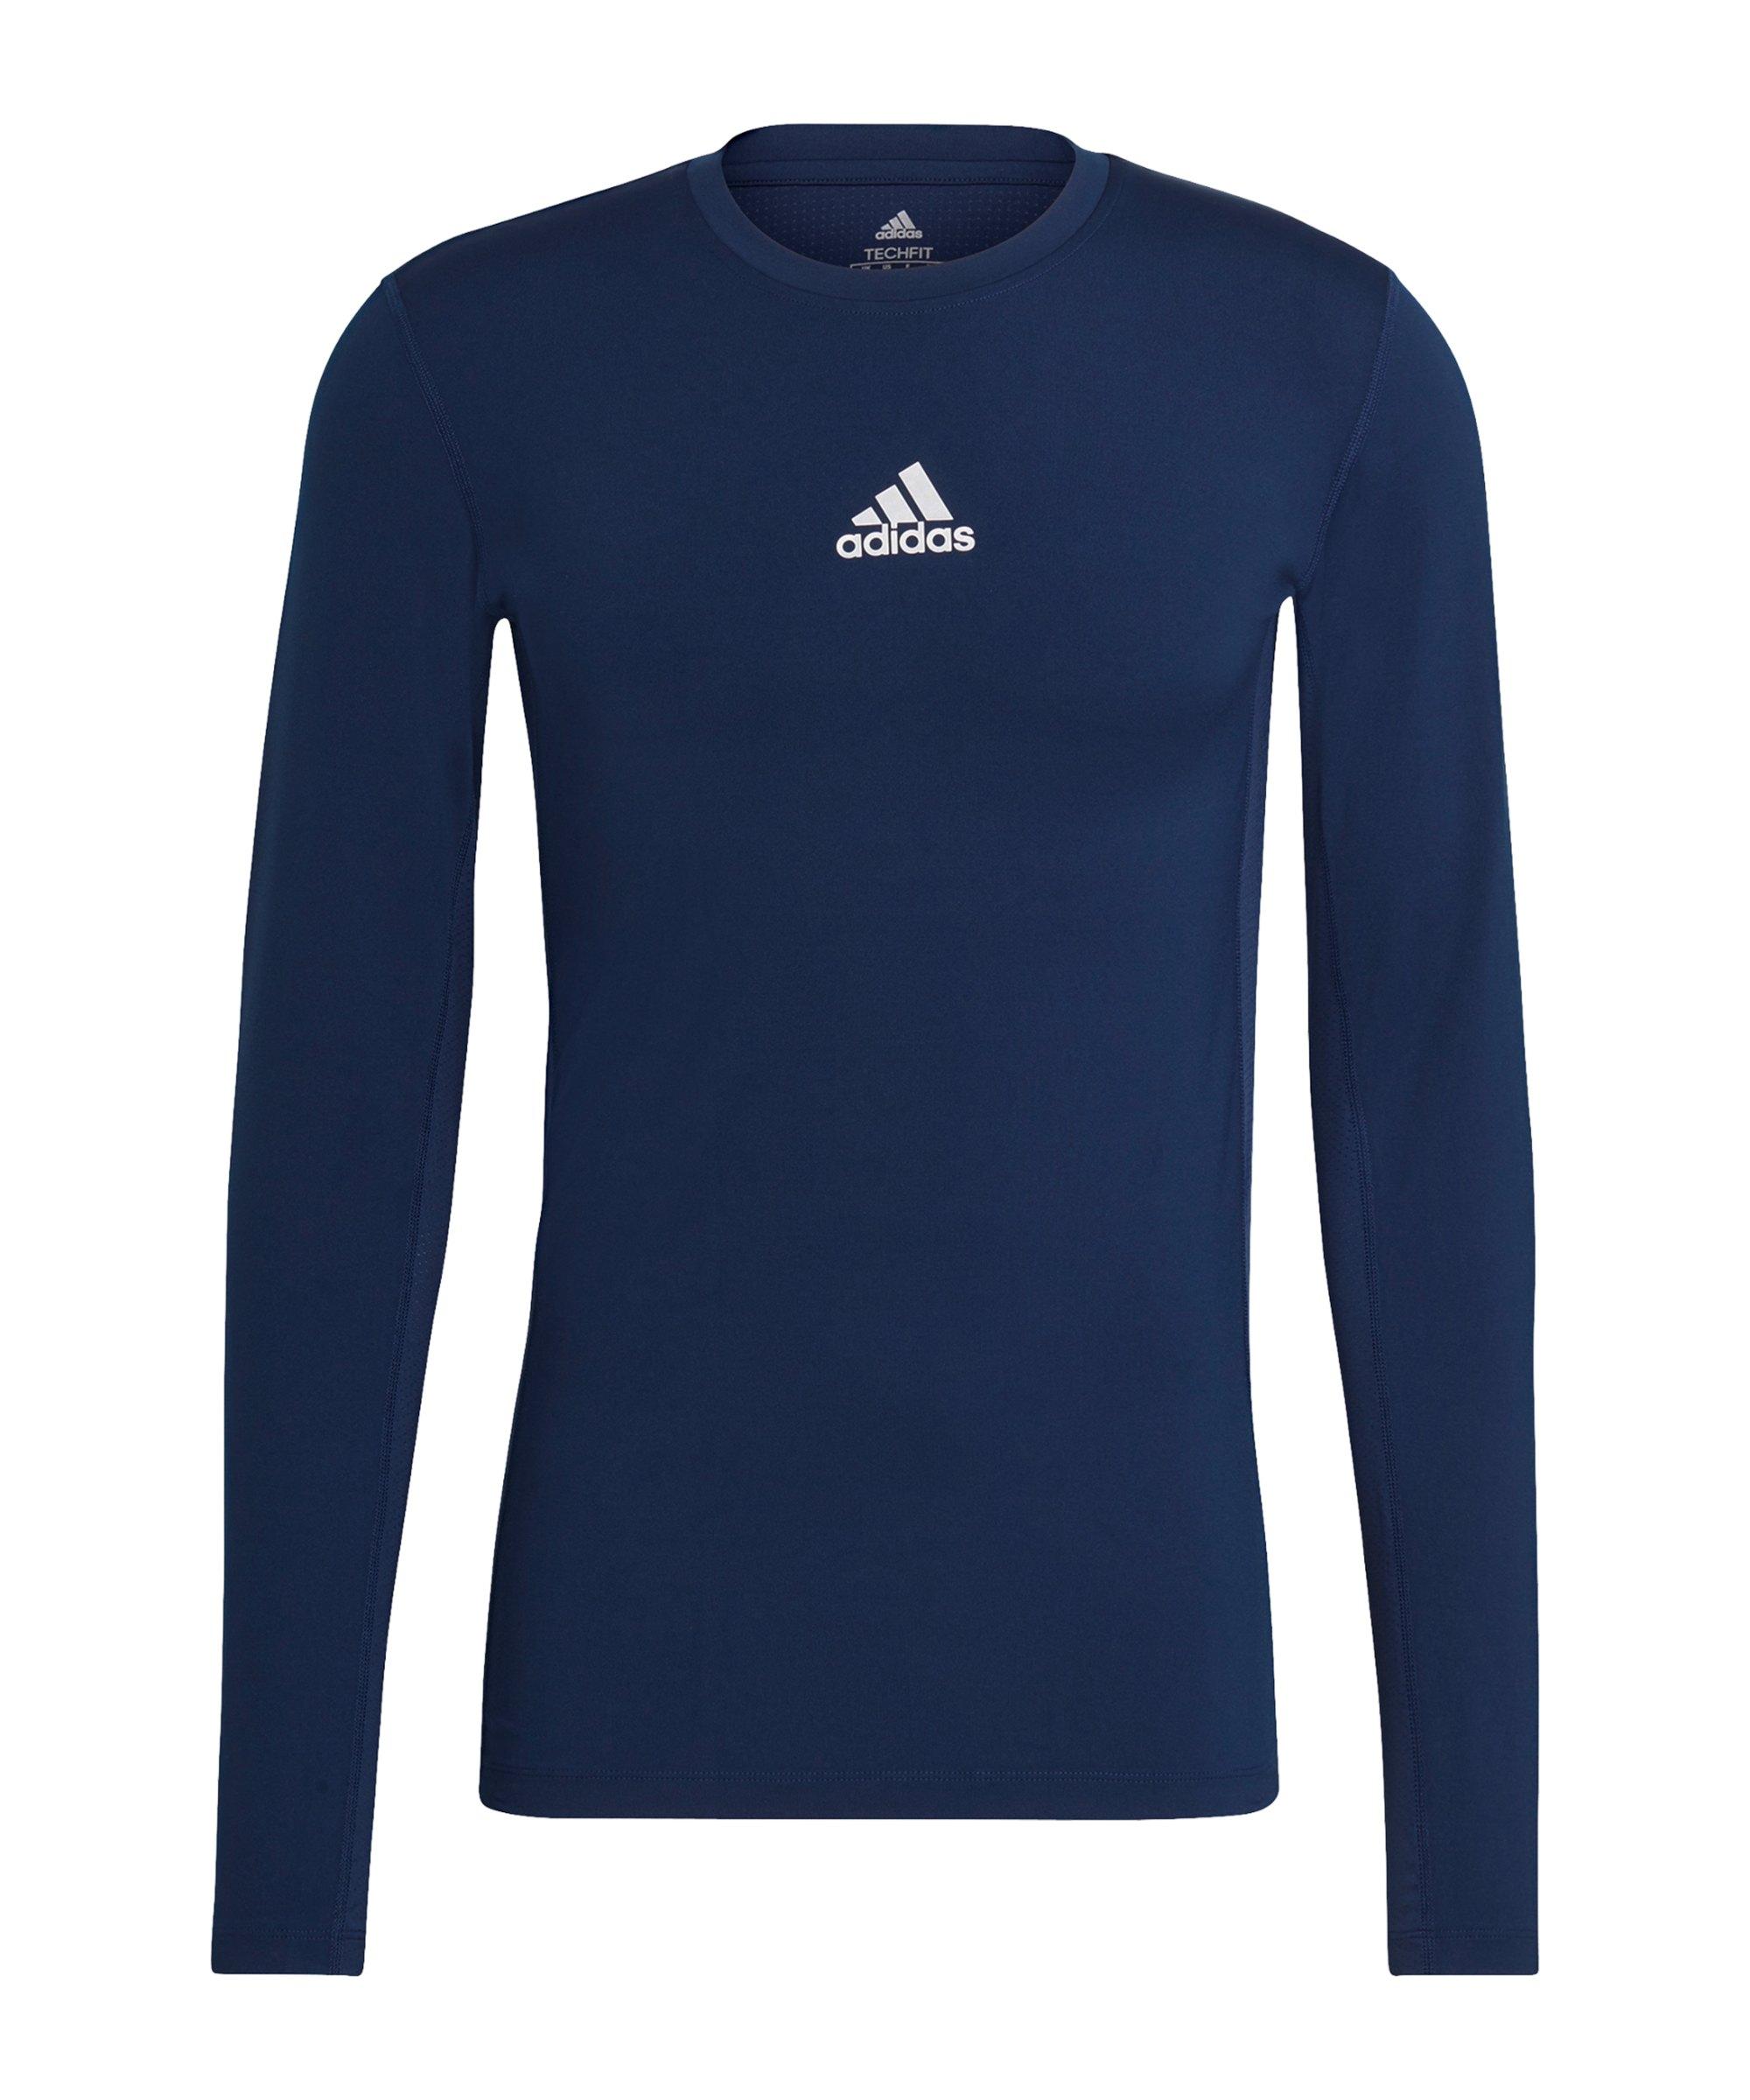 adidas Techfit Shirt langarm Dunkelblau - blau